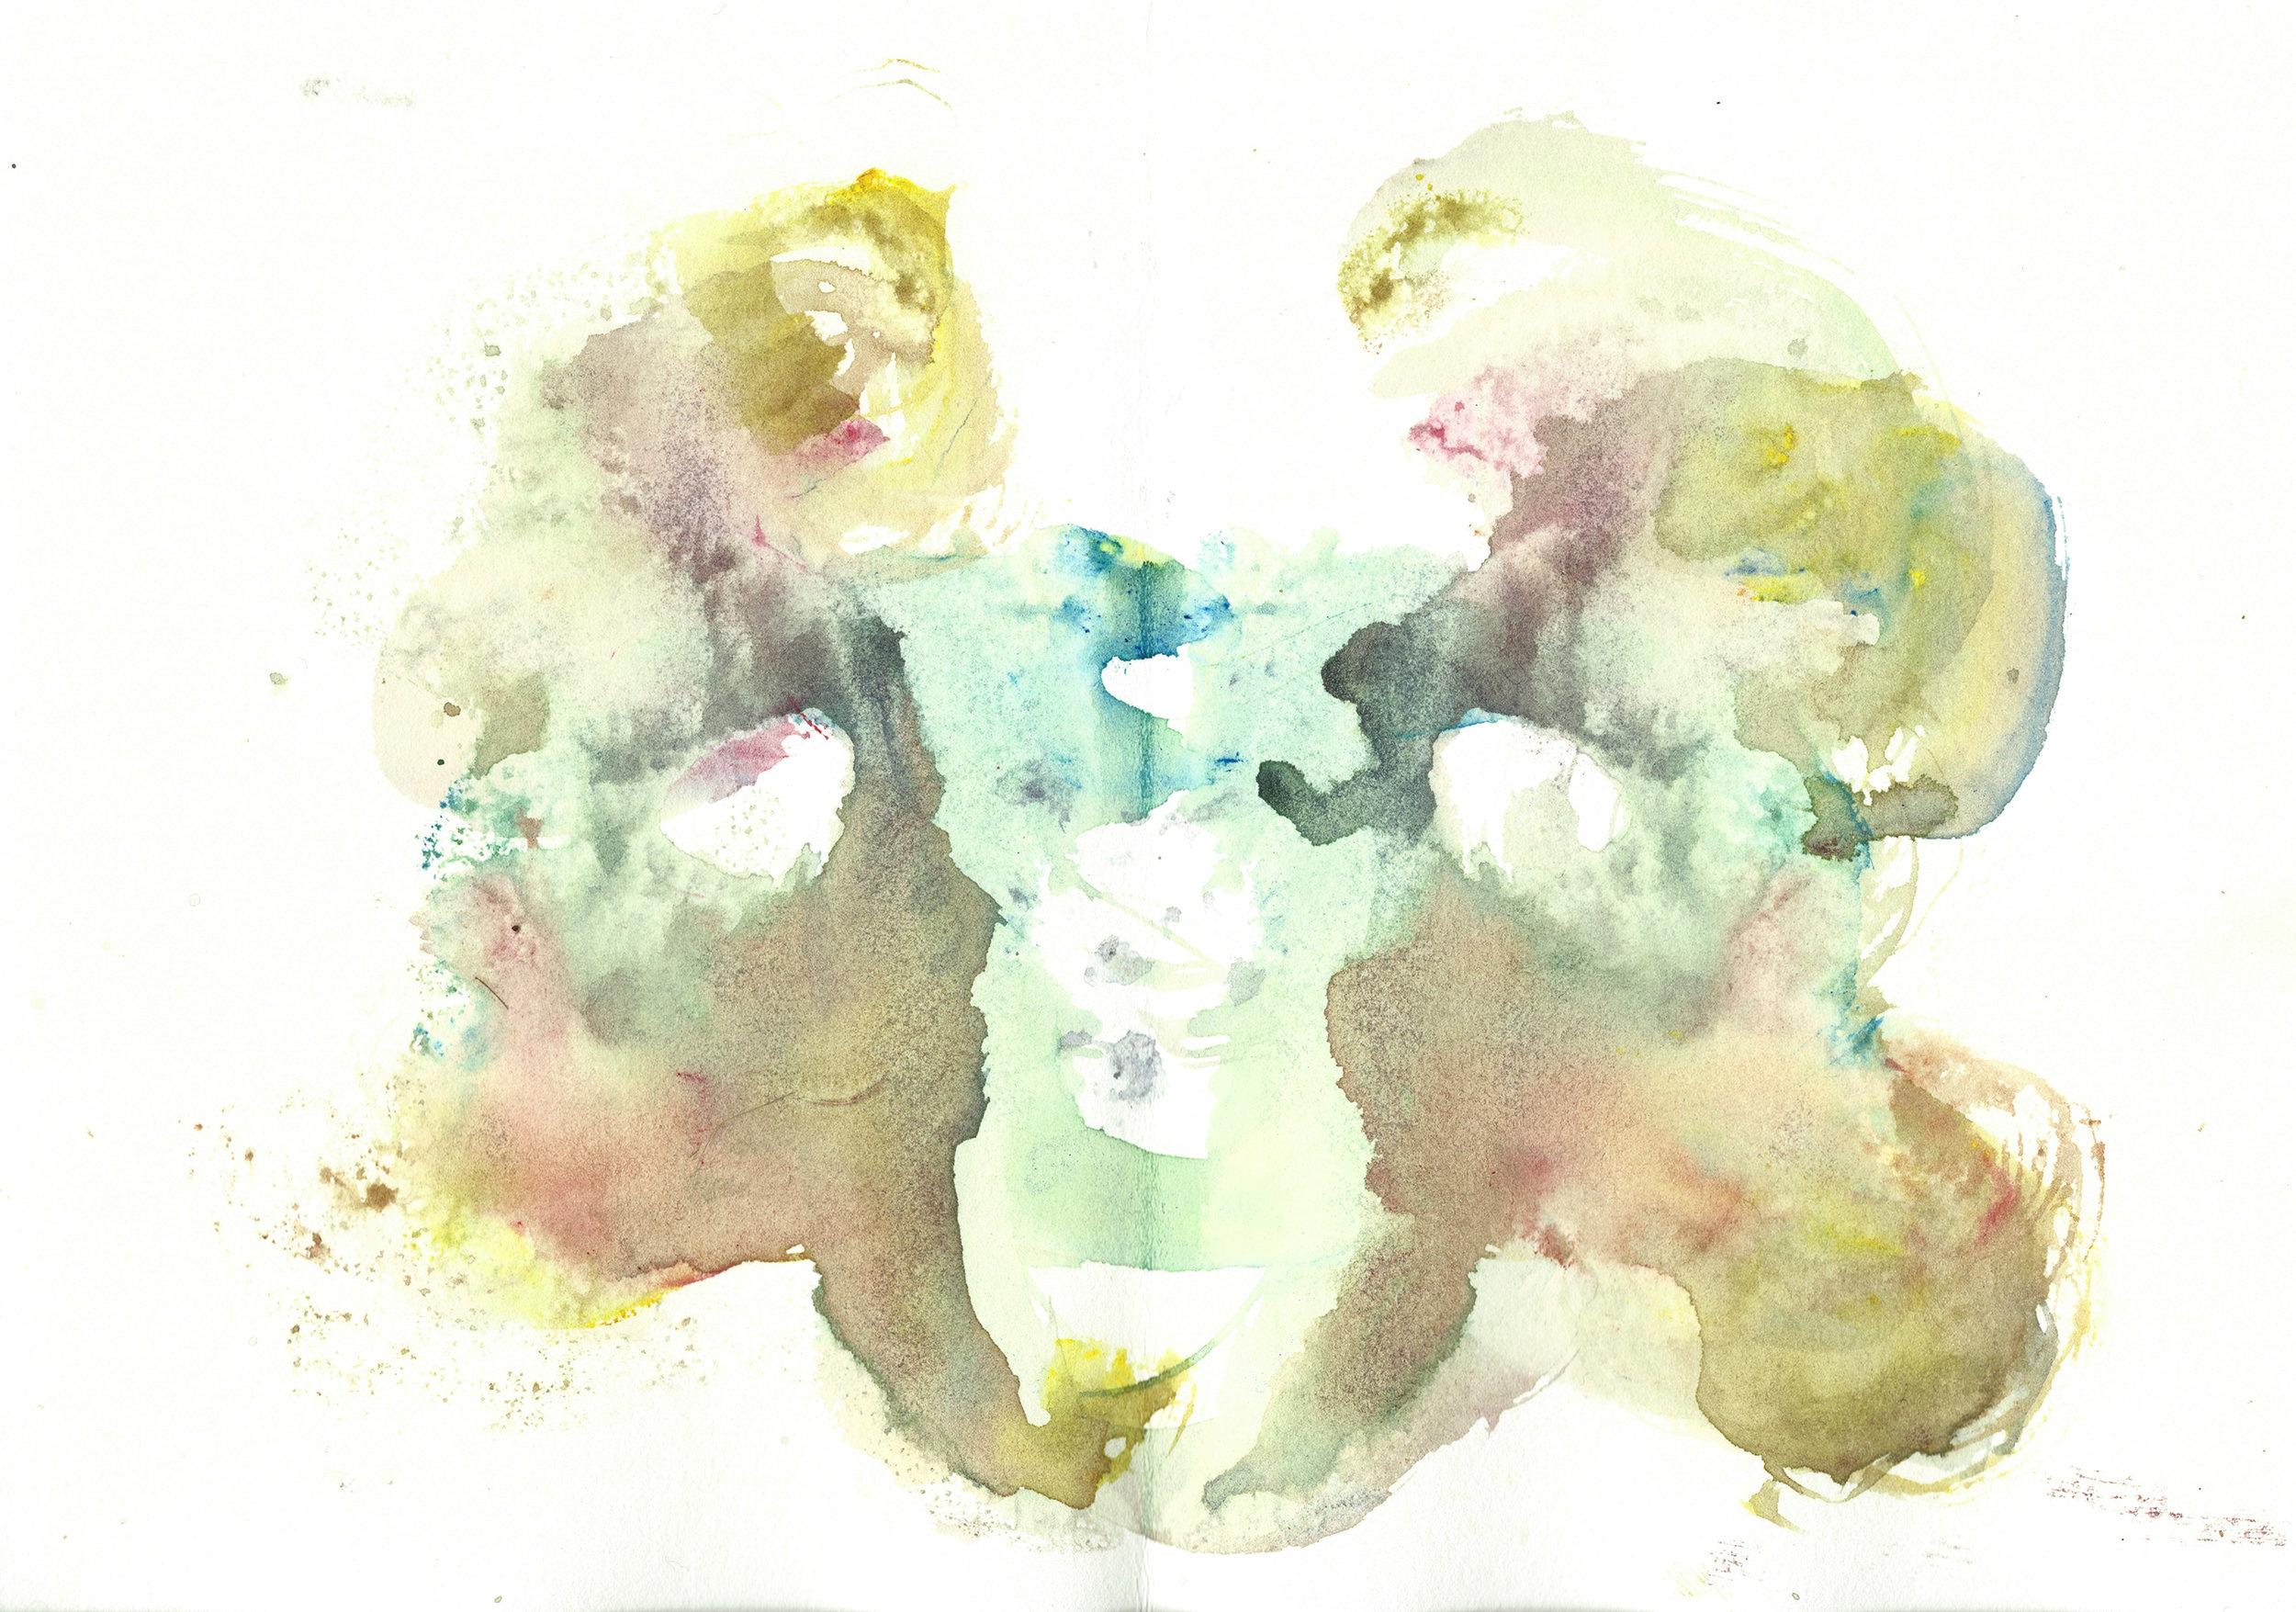 Stephen Thomas, Yoga, Yoga-Svarupa, watercolor 02